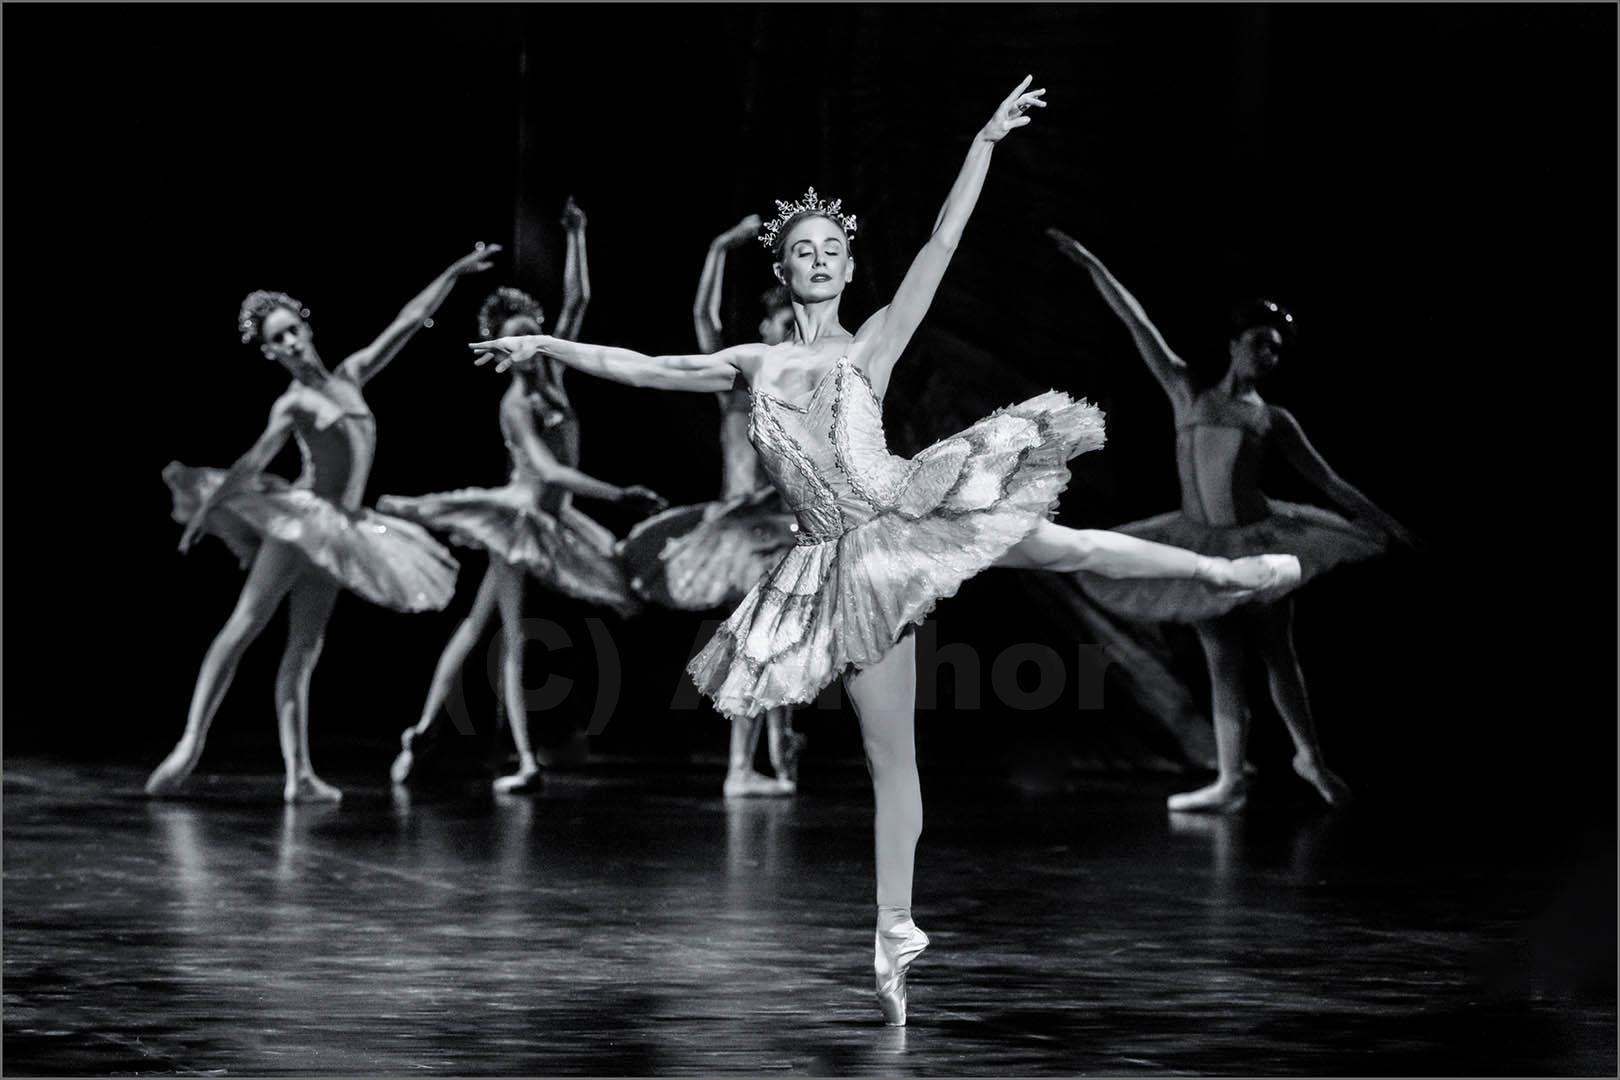 3_PI_The Ballet Don Quixote _Stephen Kangisser